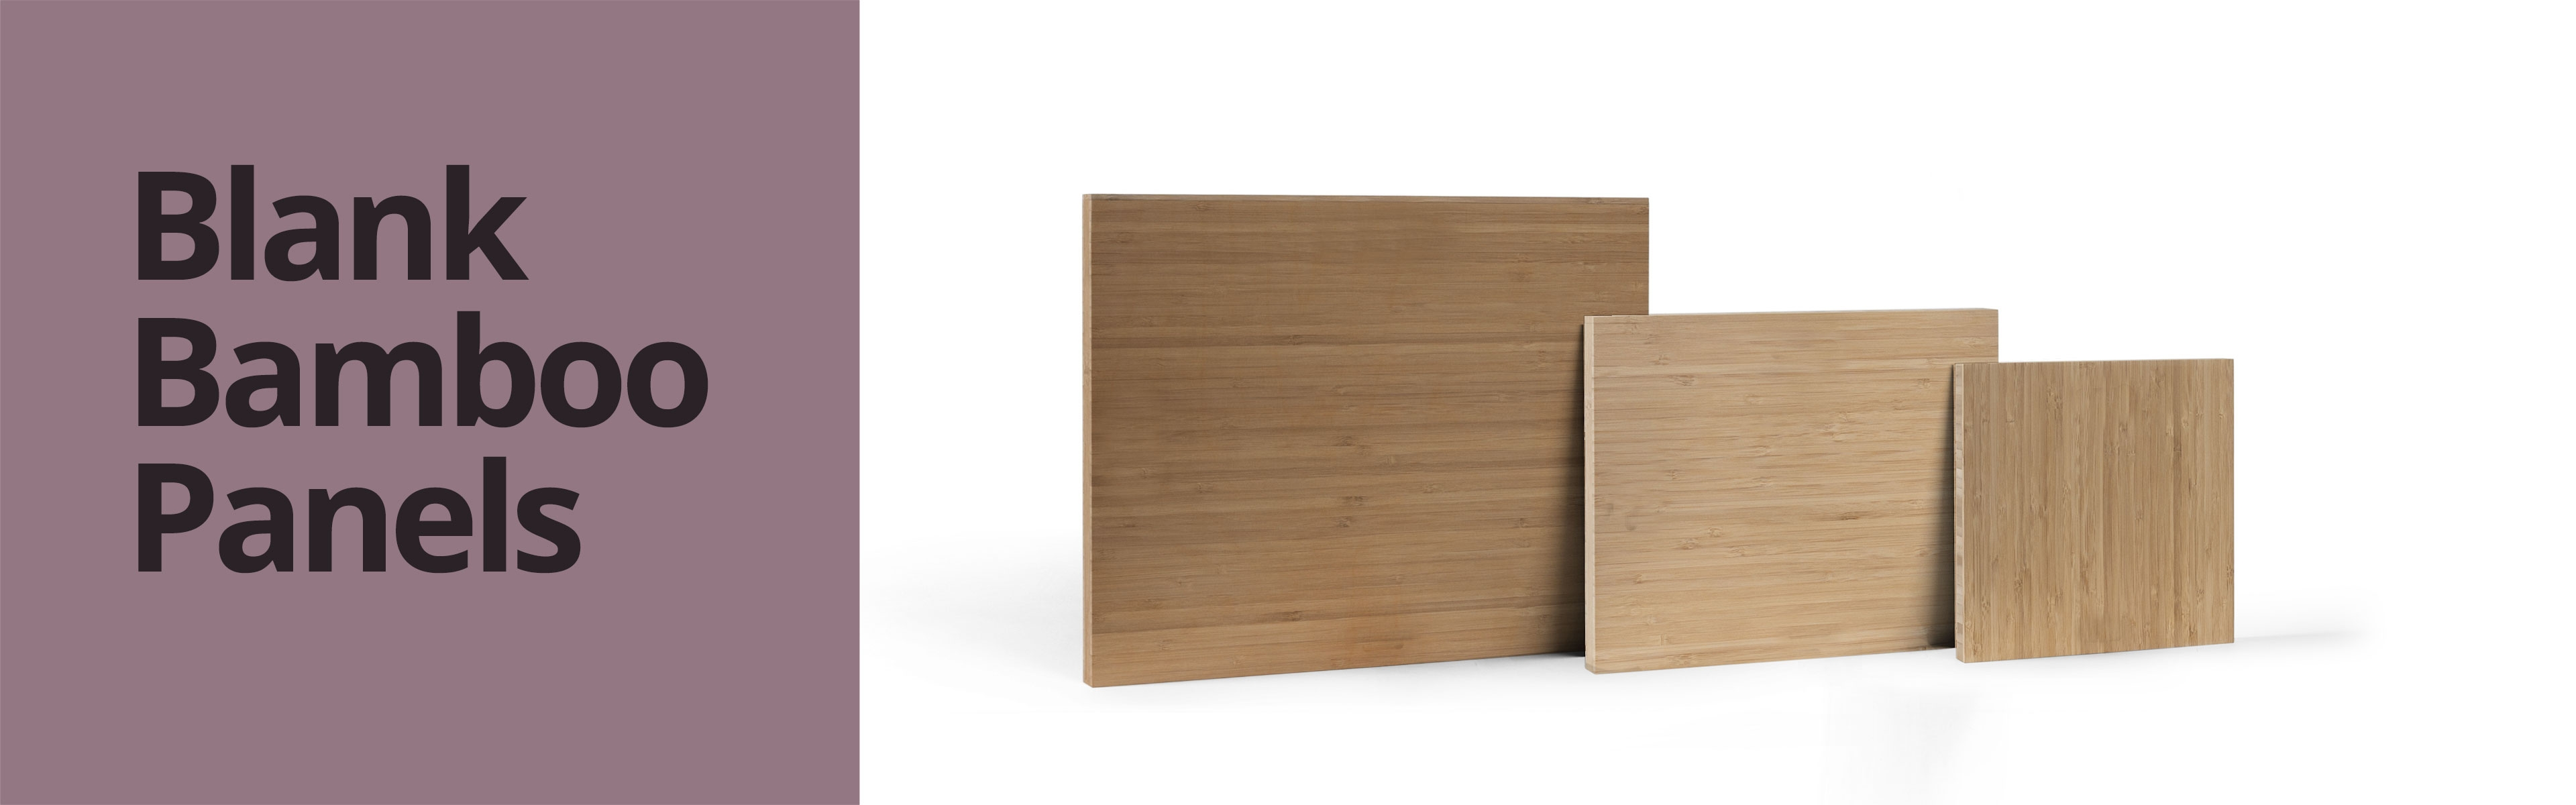 Blank Bamboo Panels